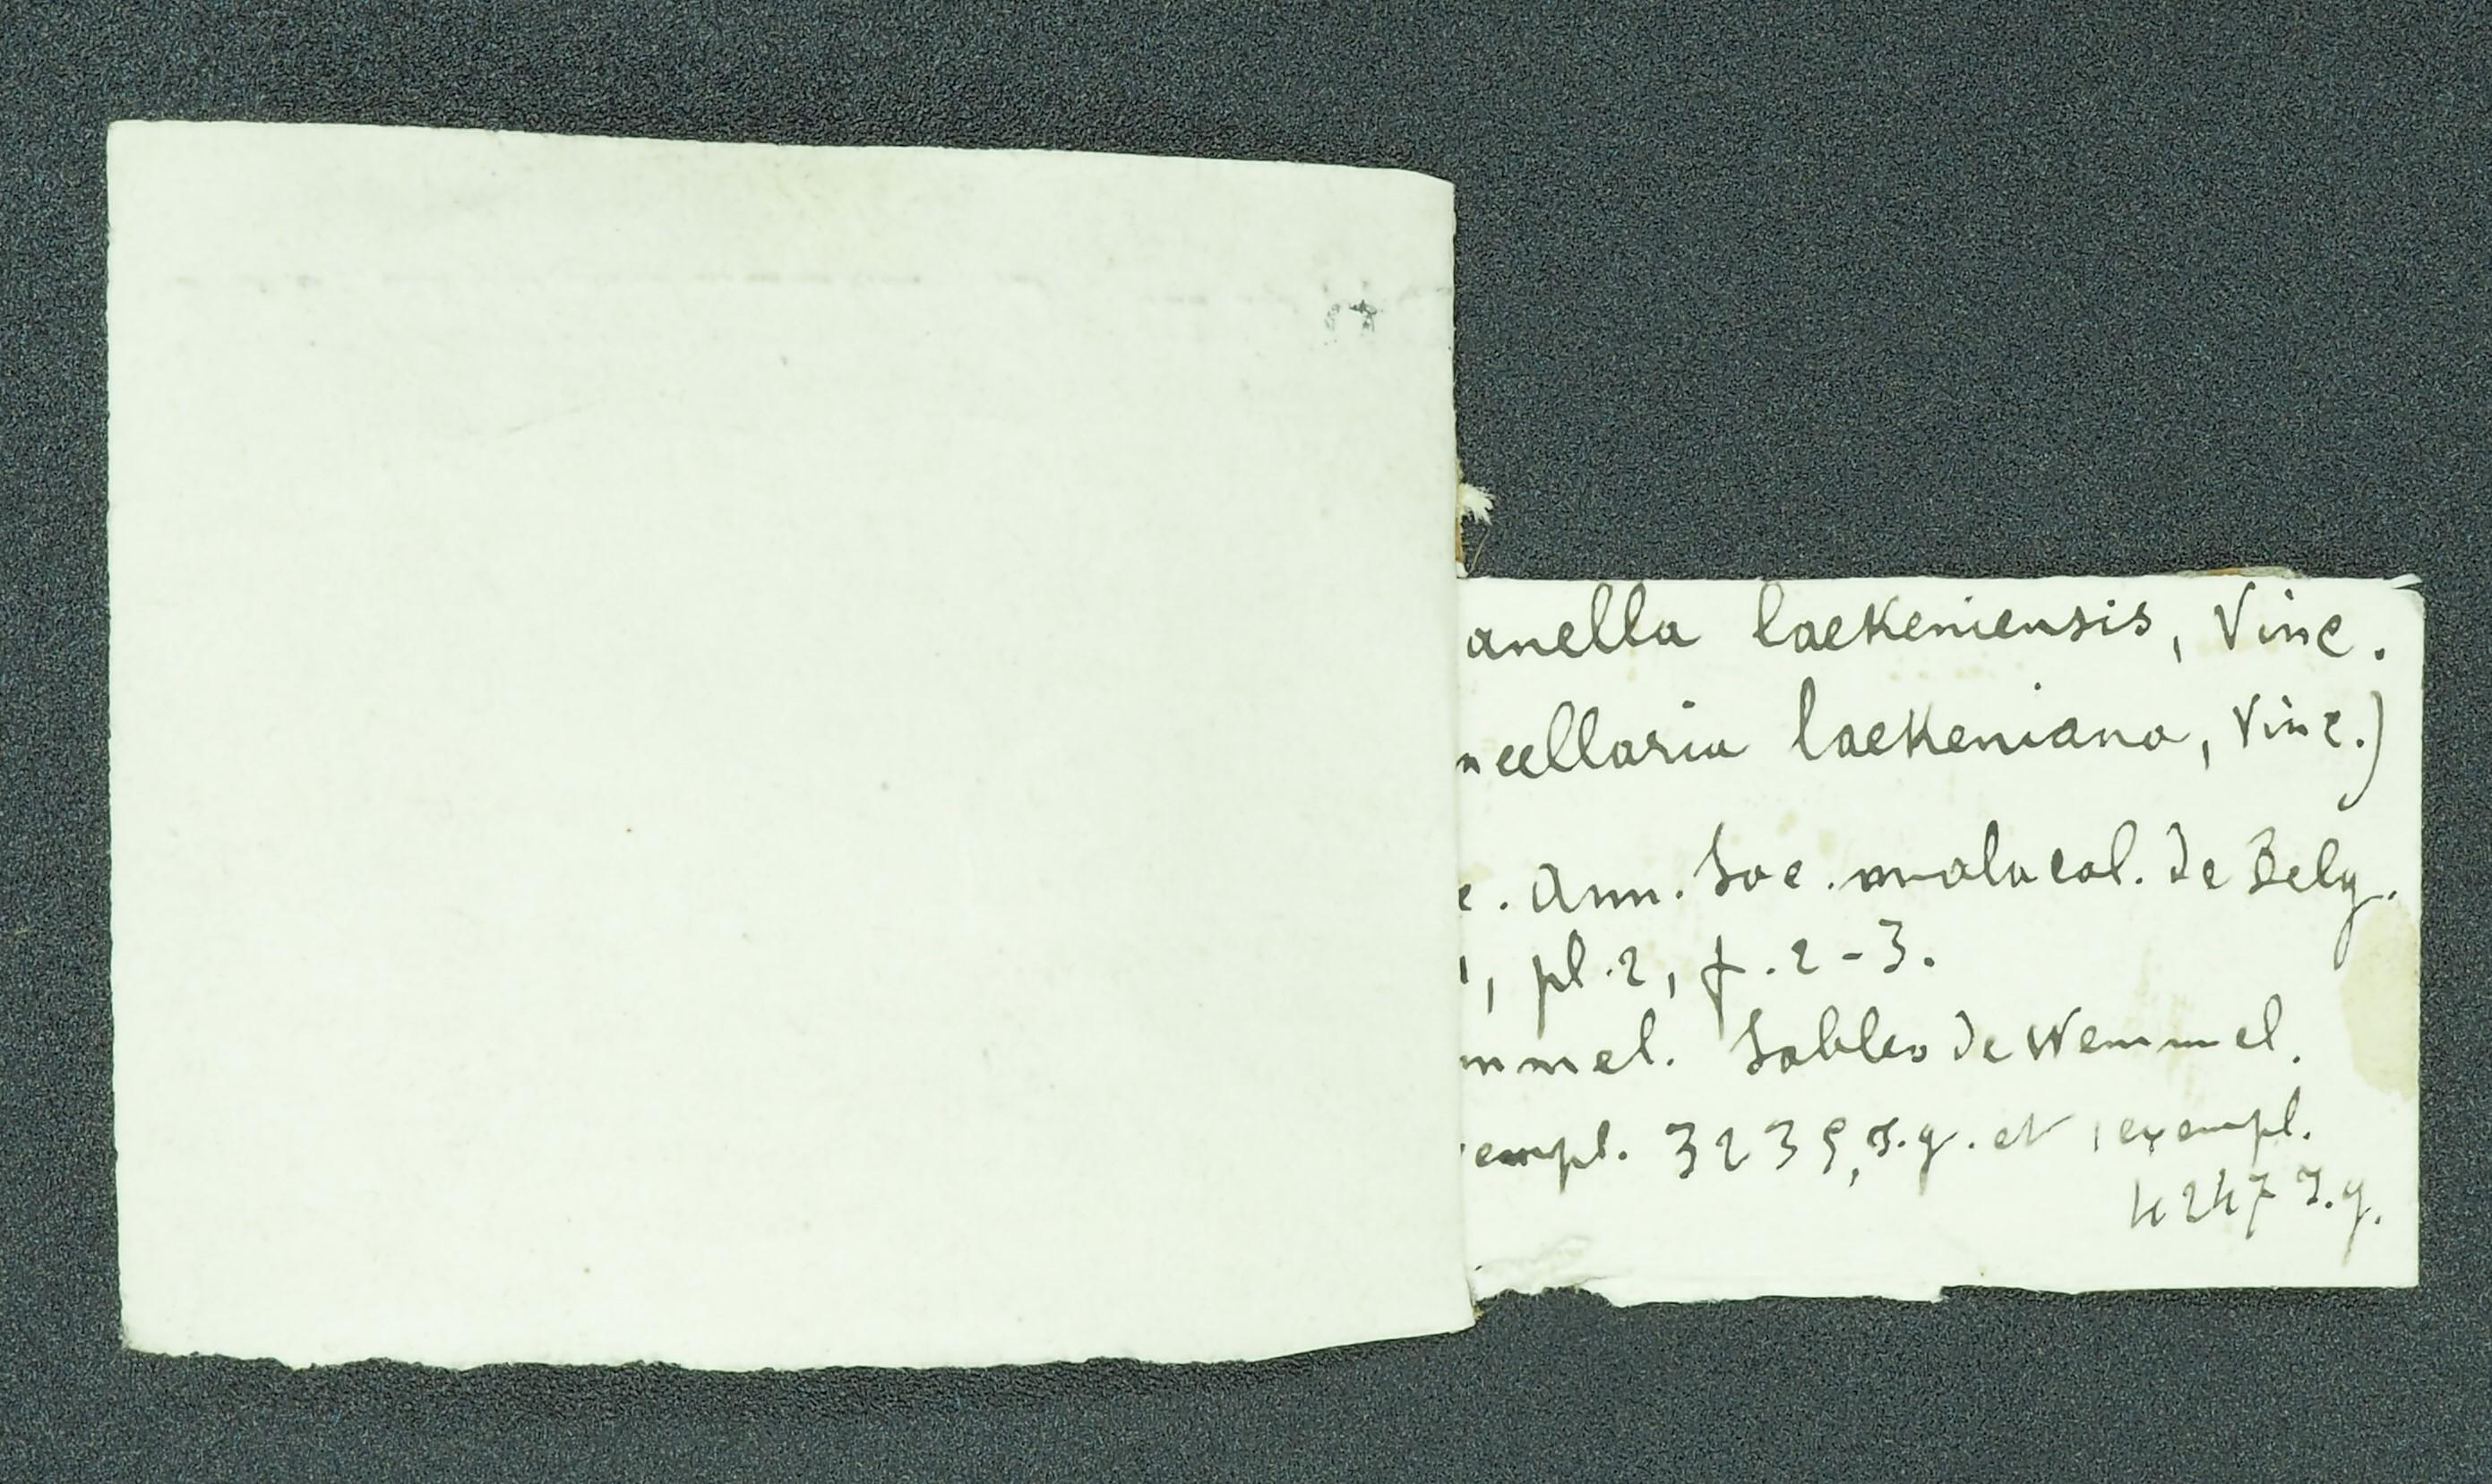 RBINS 323 - Pisanella laekeniana ht Lb2